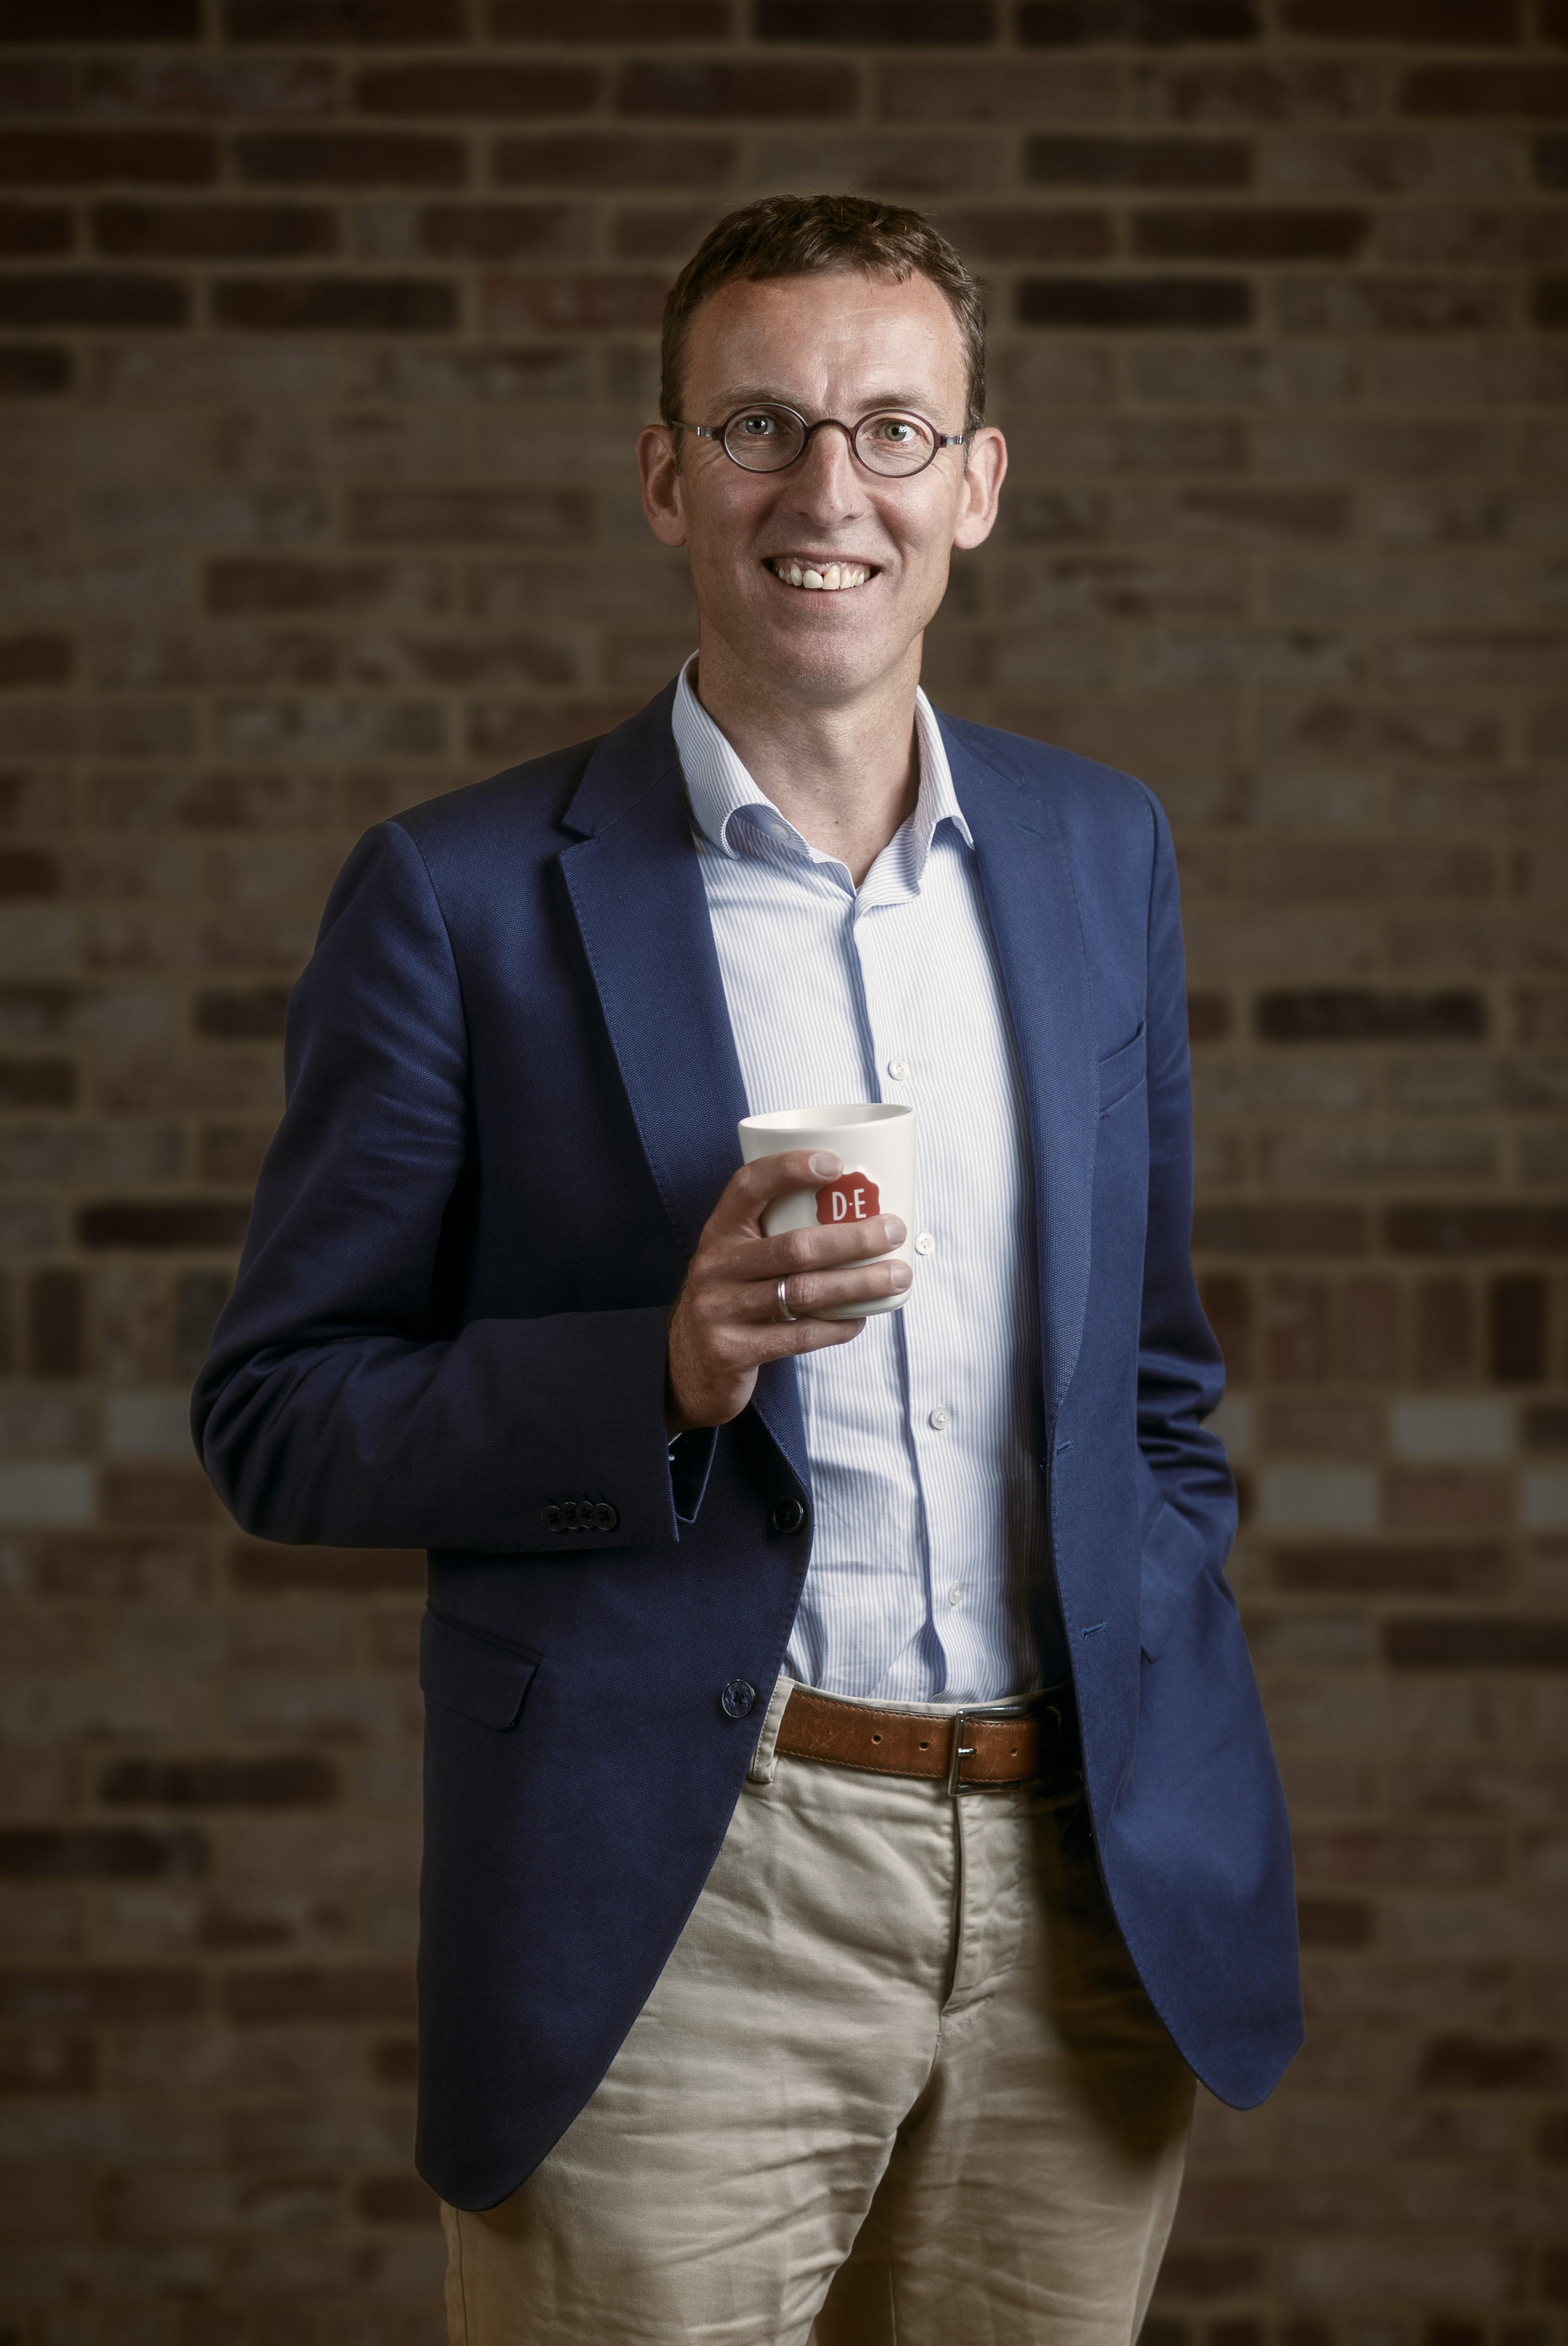 John Brands JDE general manager retail bij Jacobs Douwe Egberts (JDE)